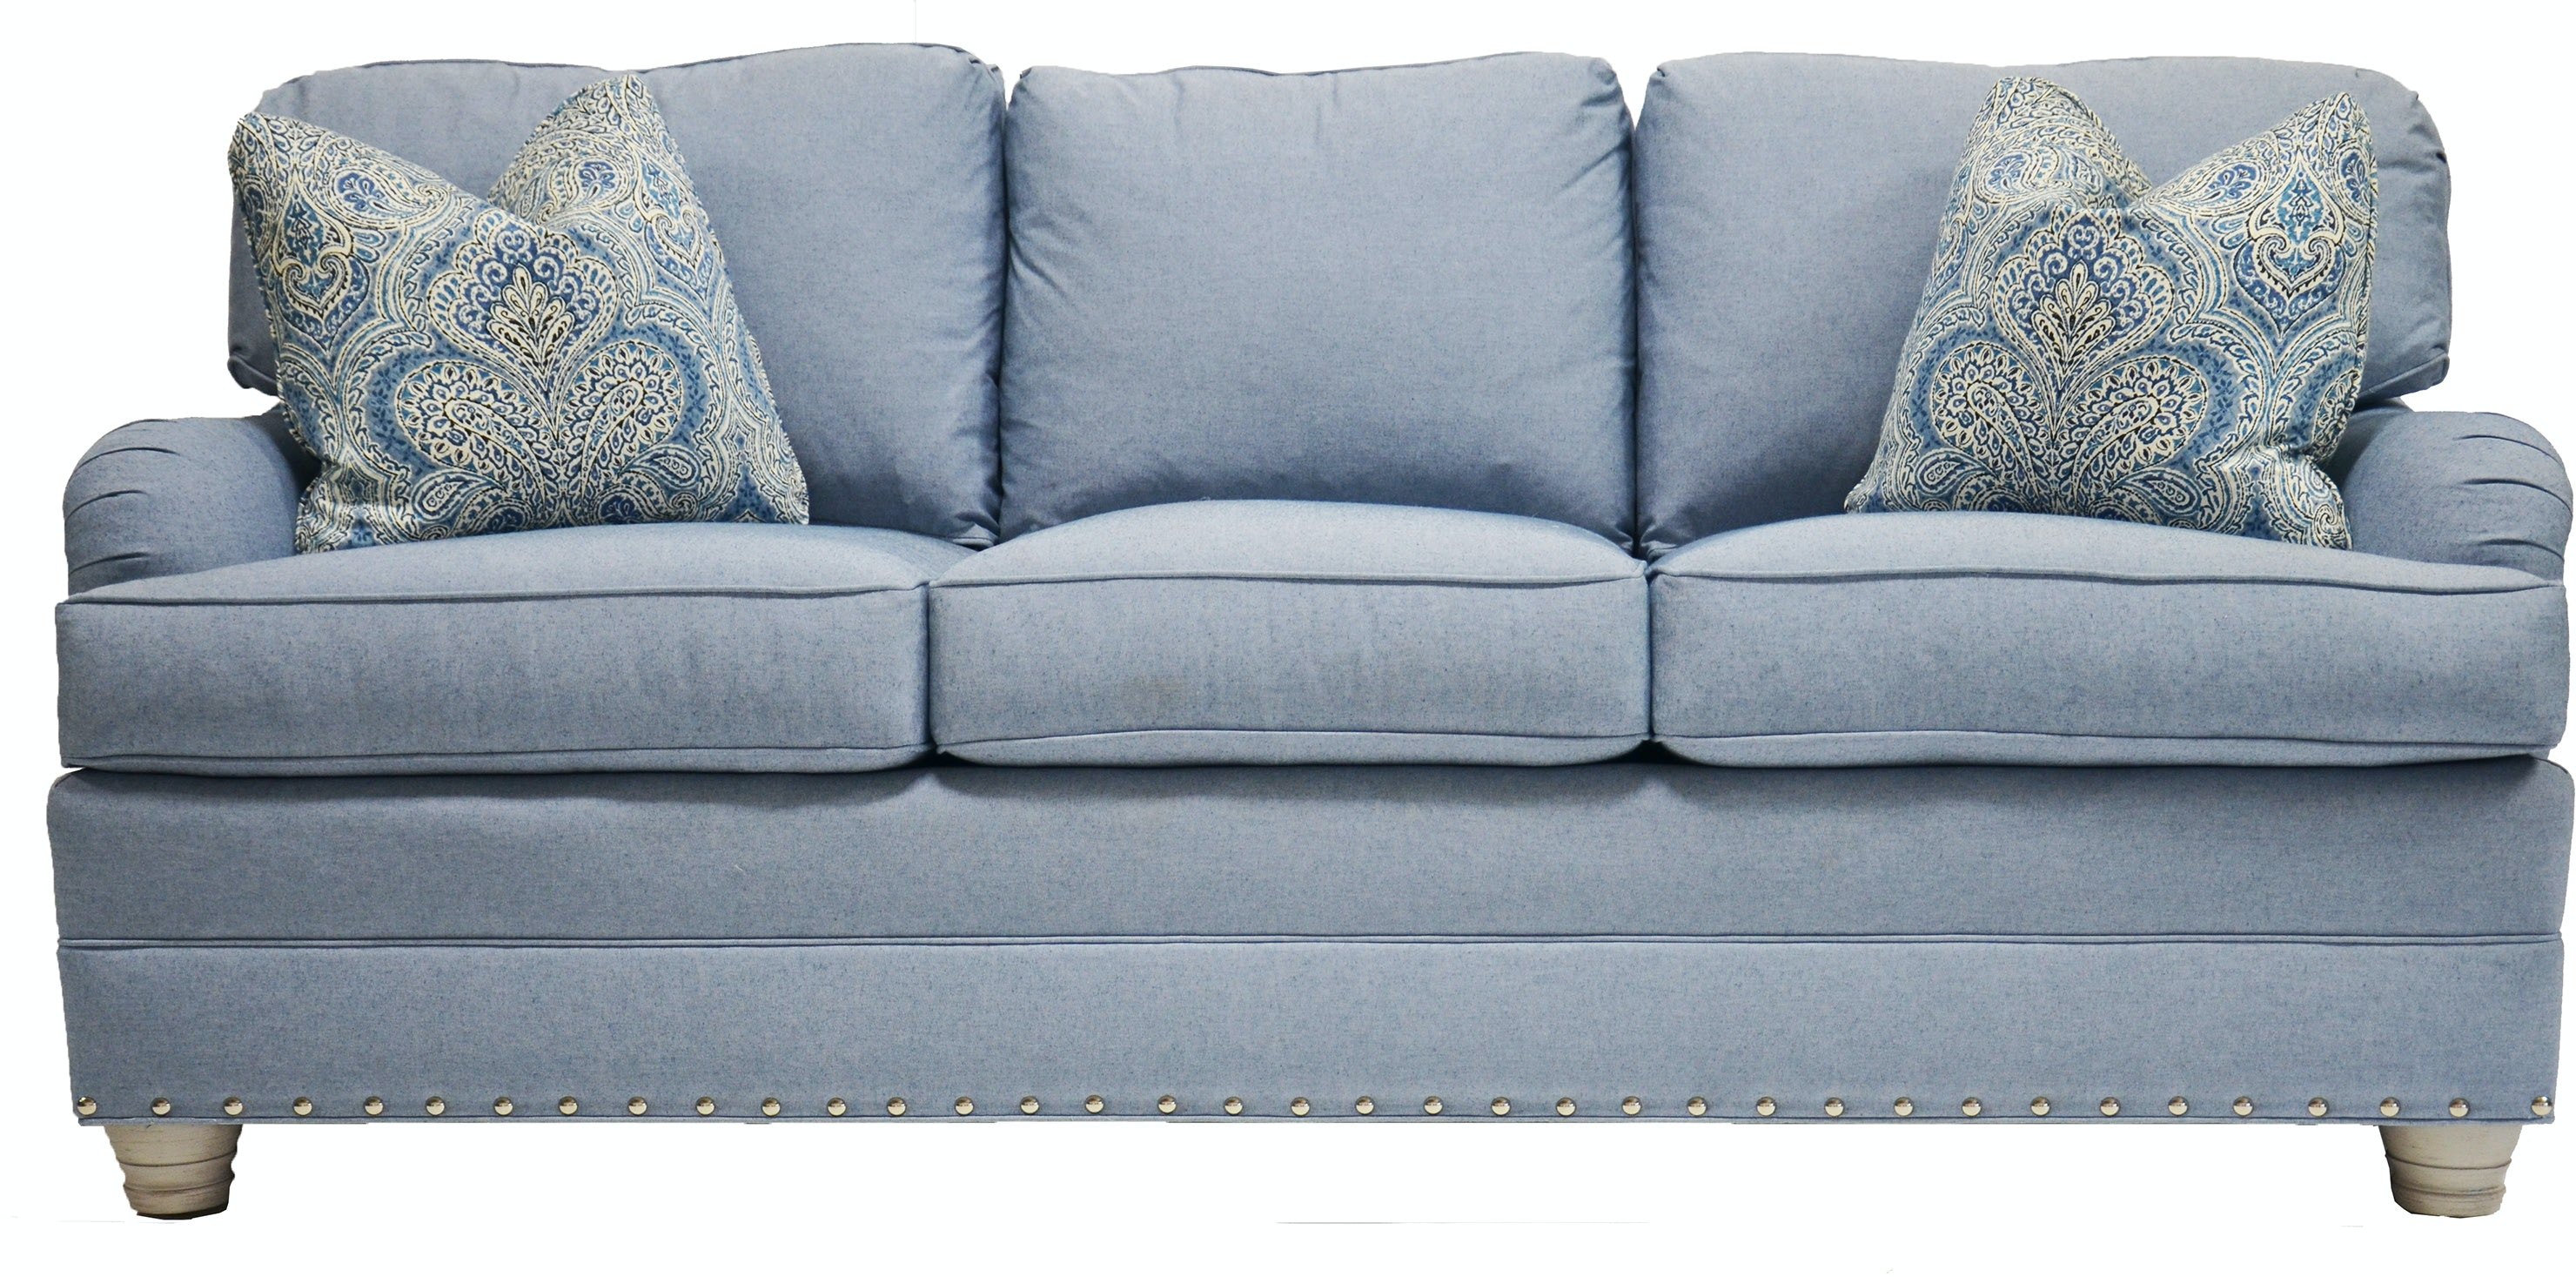 Vanguard Furniture Living Room East Lake Sleep Sofa 603 SS